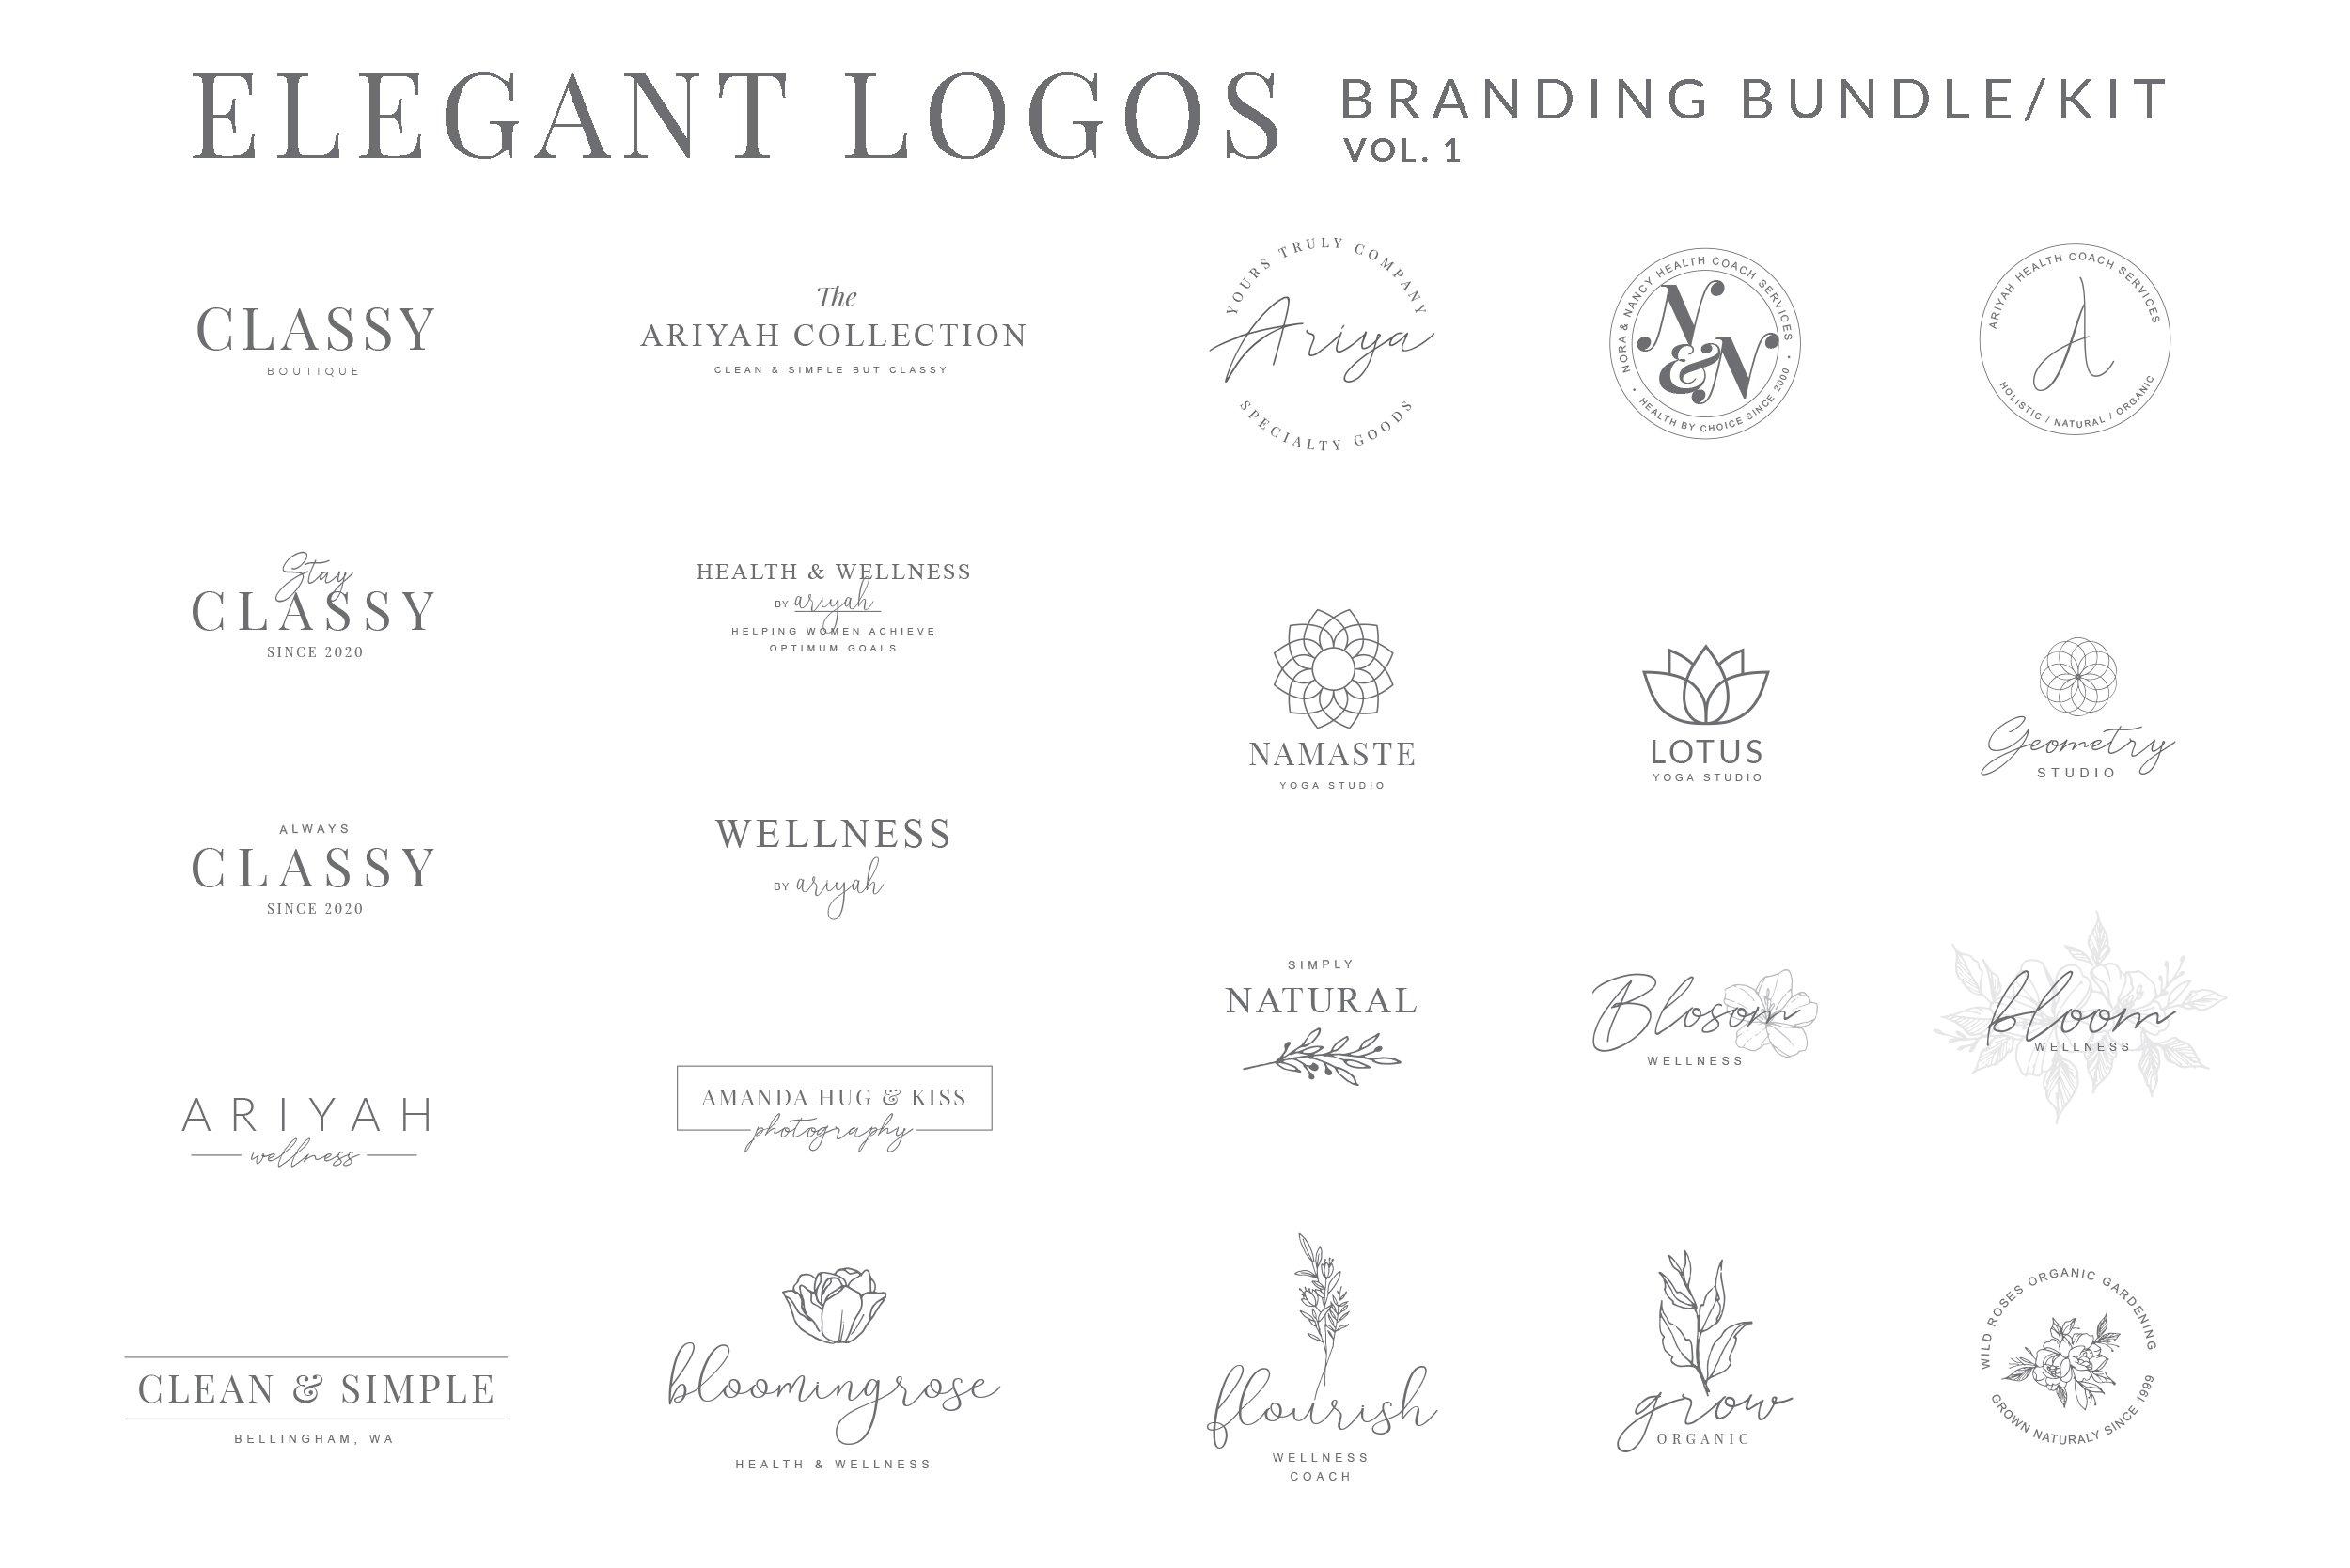 Elegant Logos Branding Kit